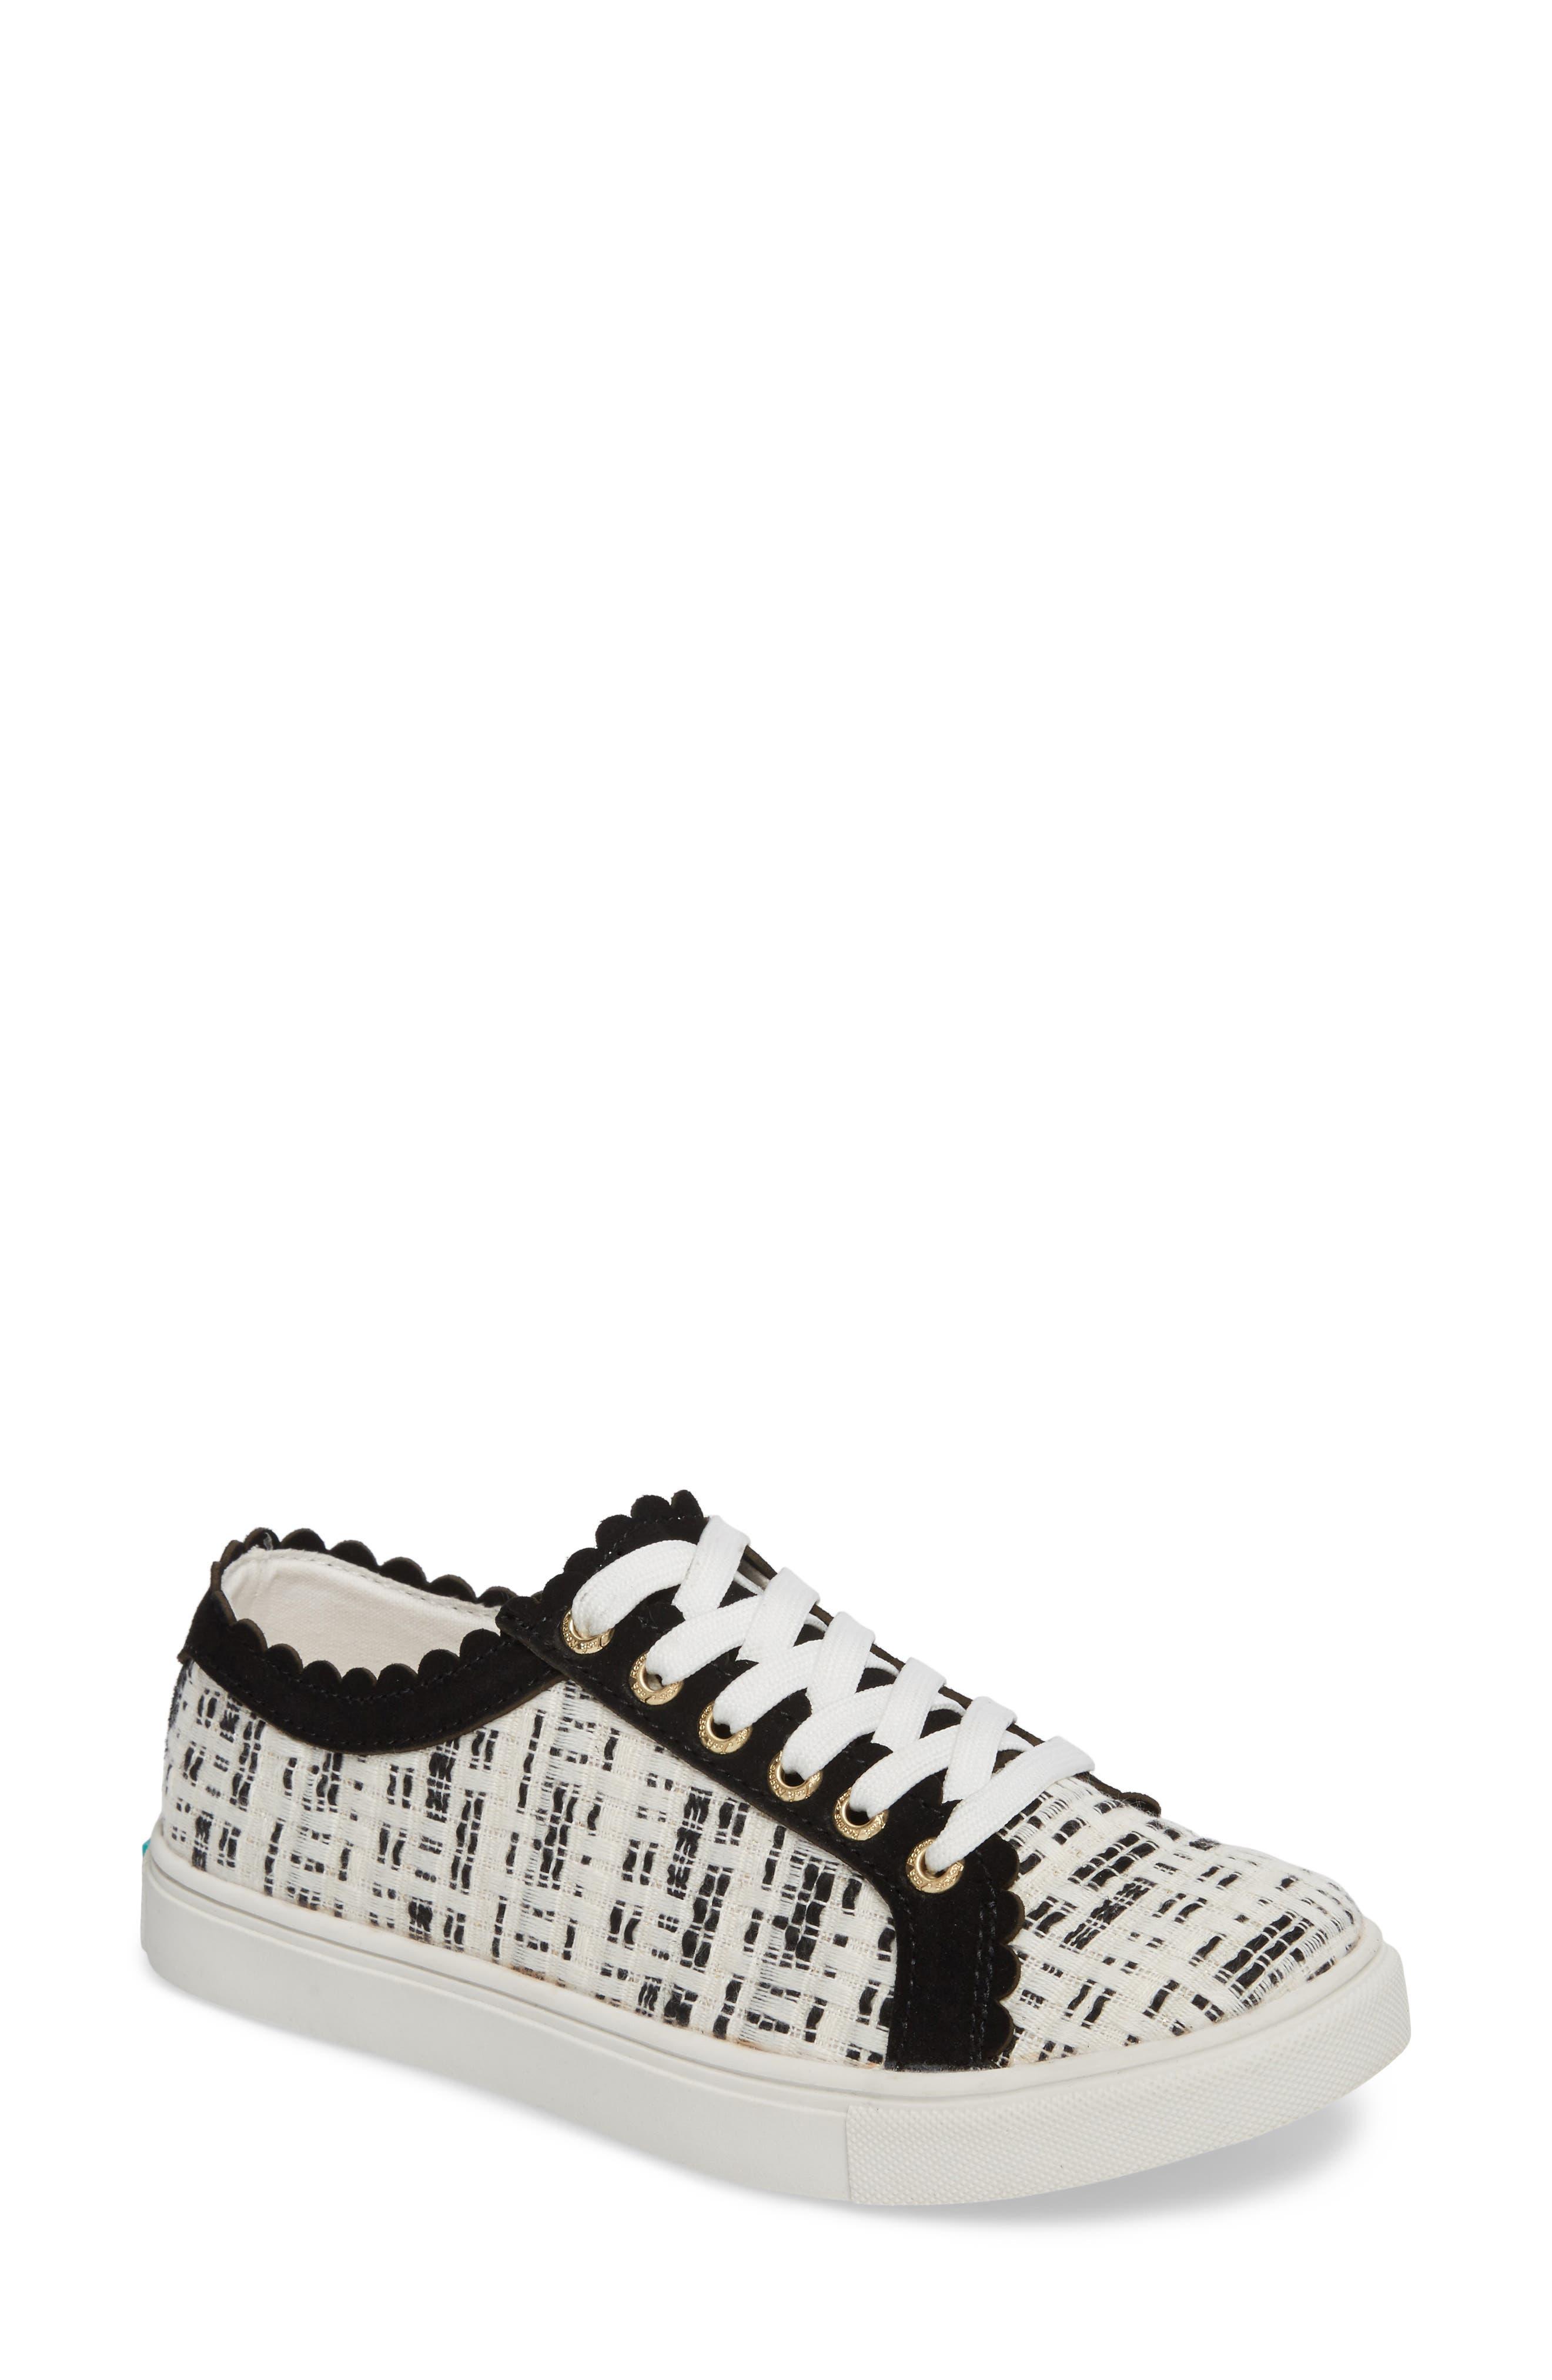 Teagan Sneaker,                         Main,                         color, 009